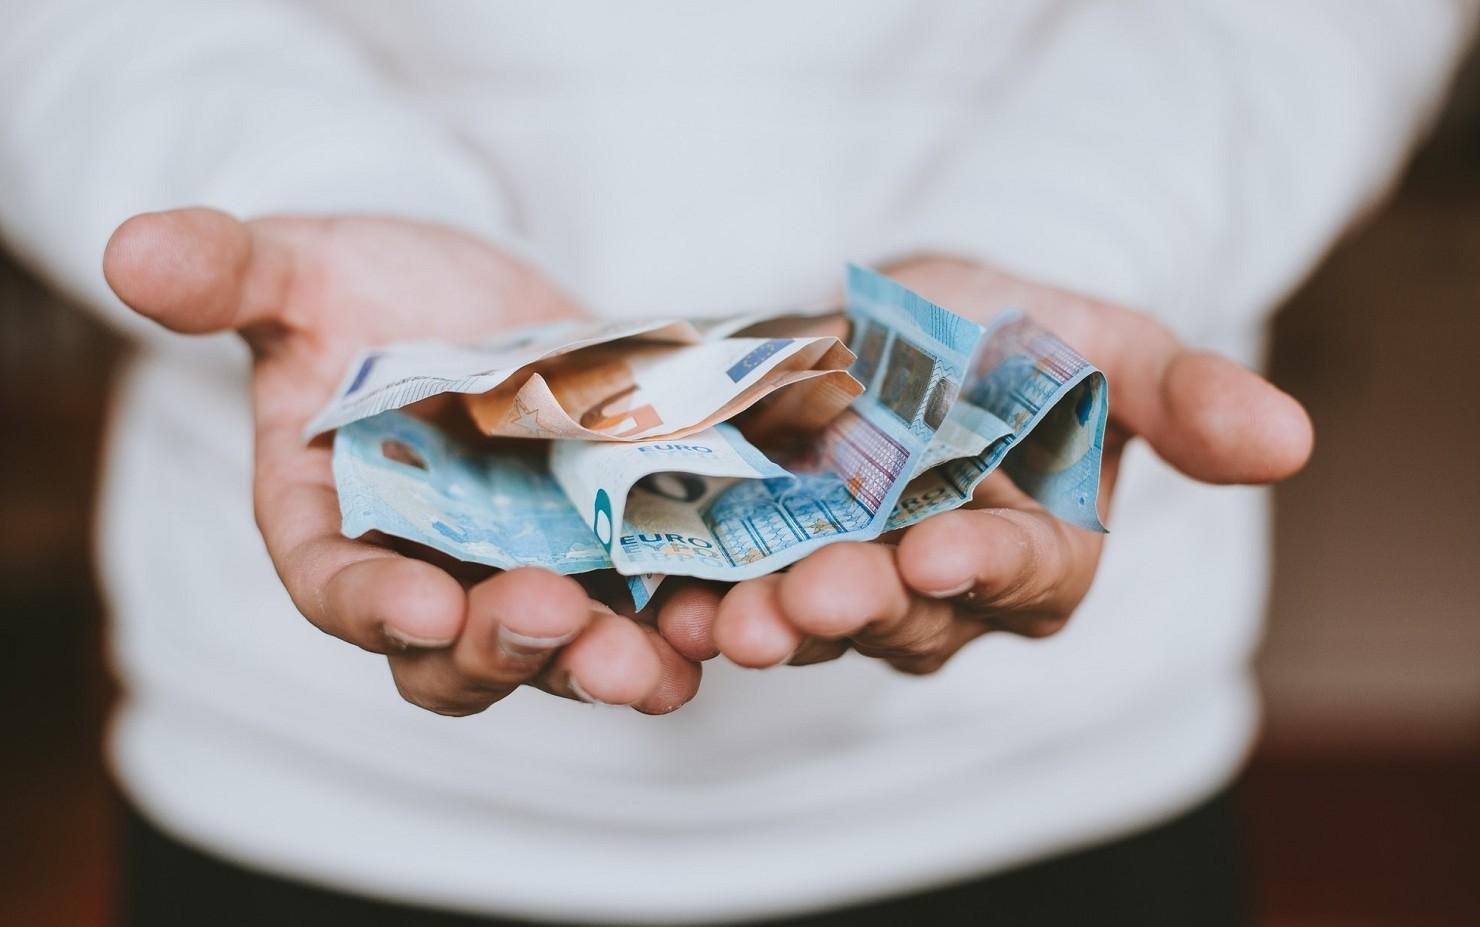 Donazioni a figli e parenti, causale bonifico quale deve essere per essere sicuri